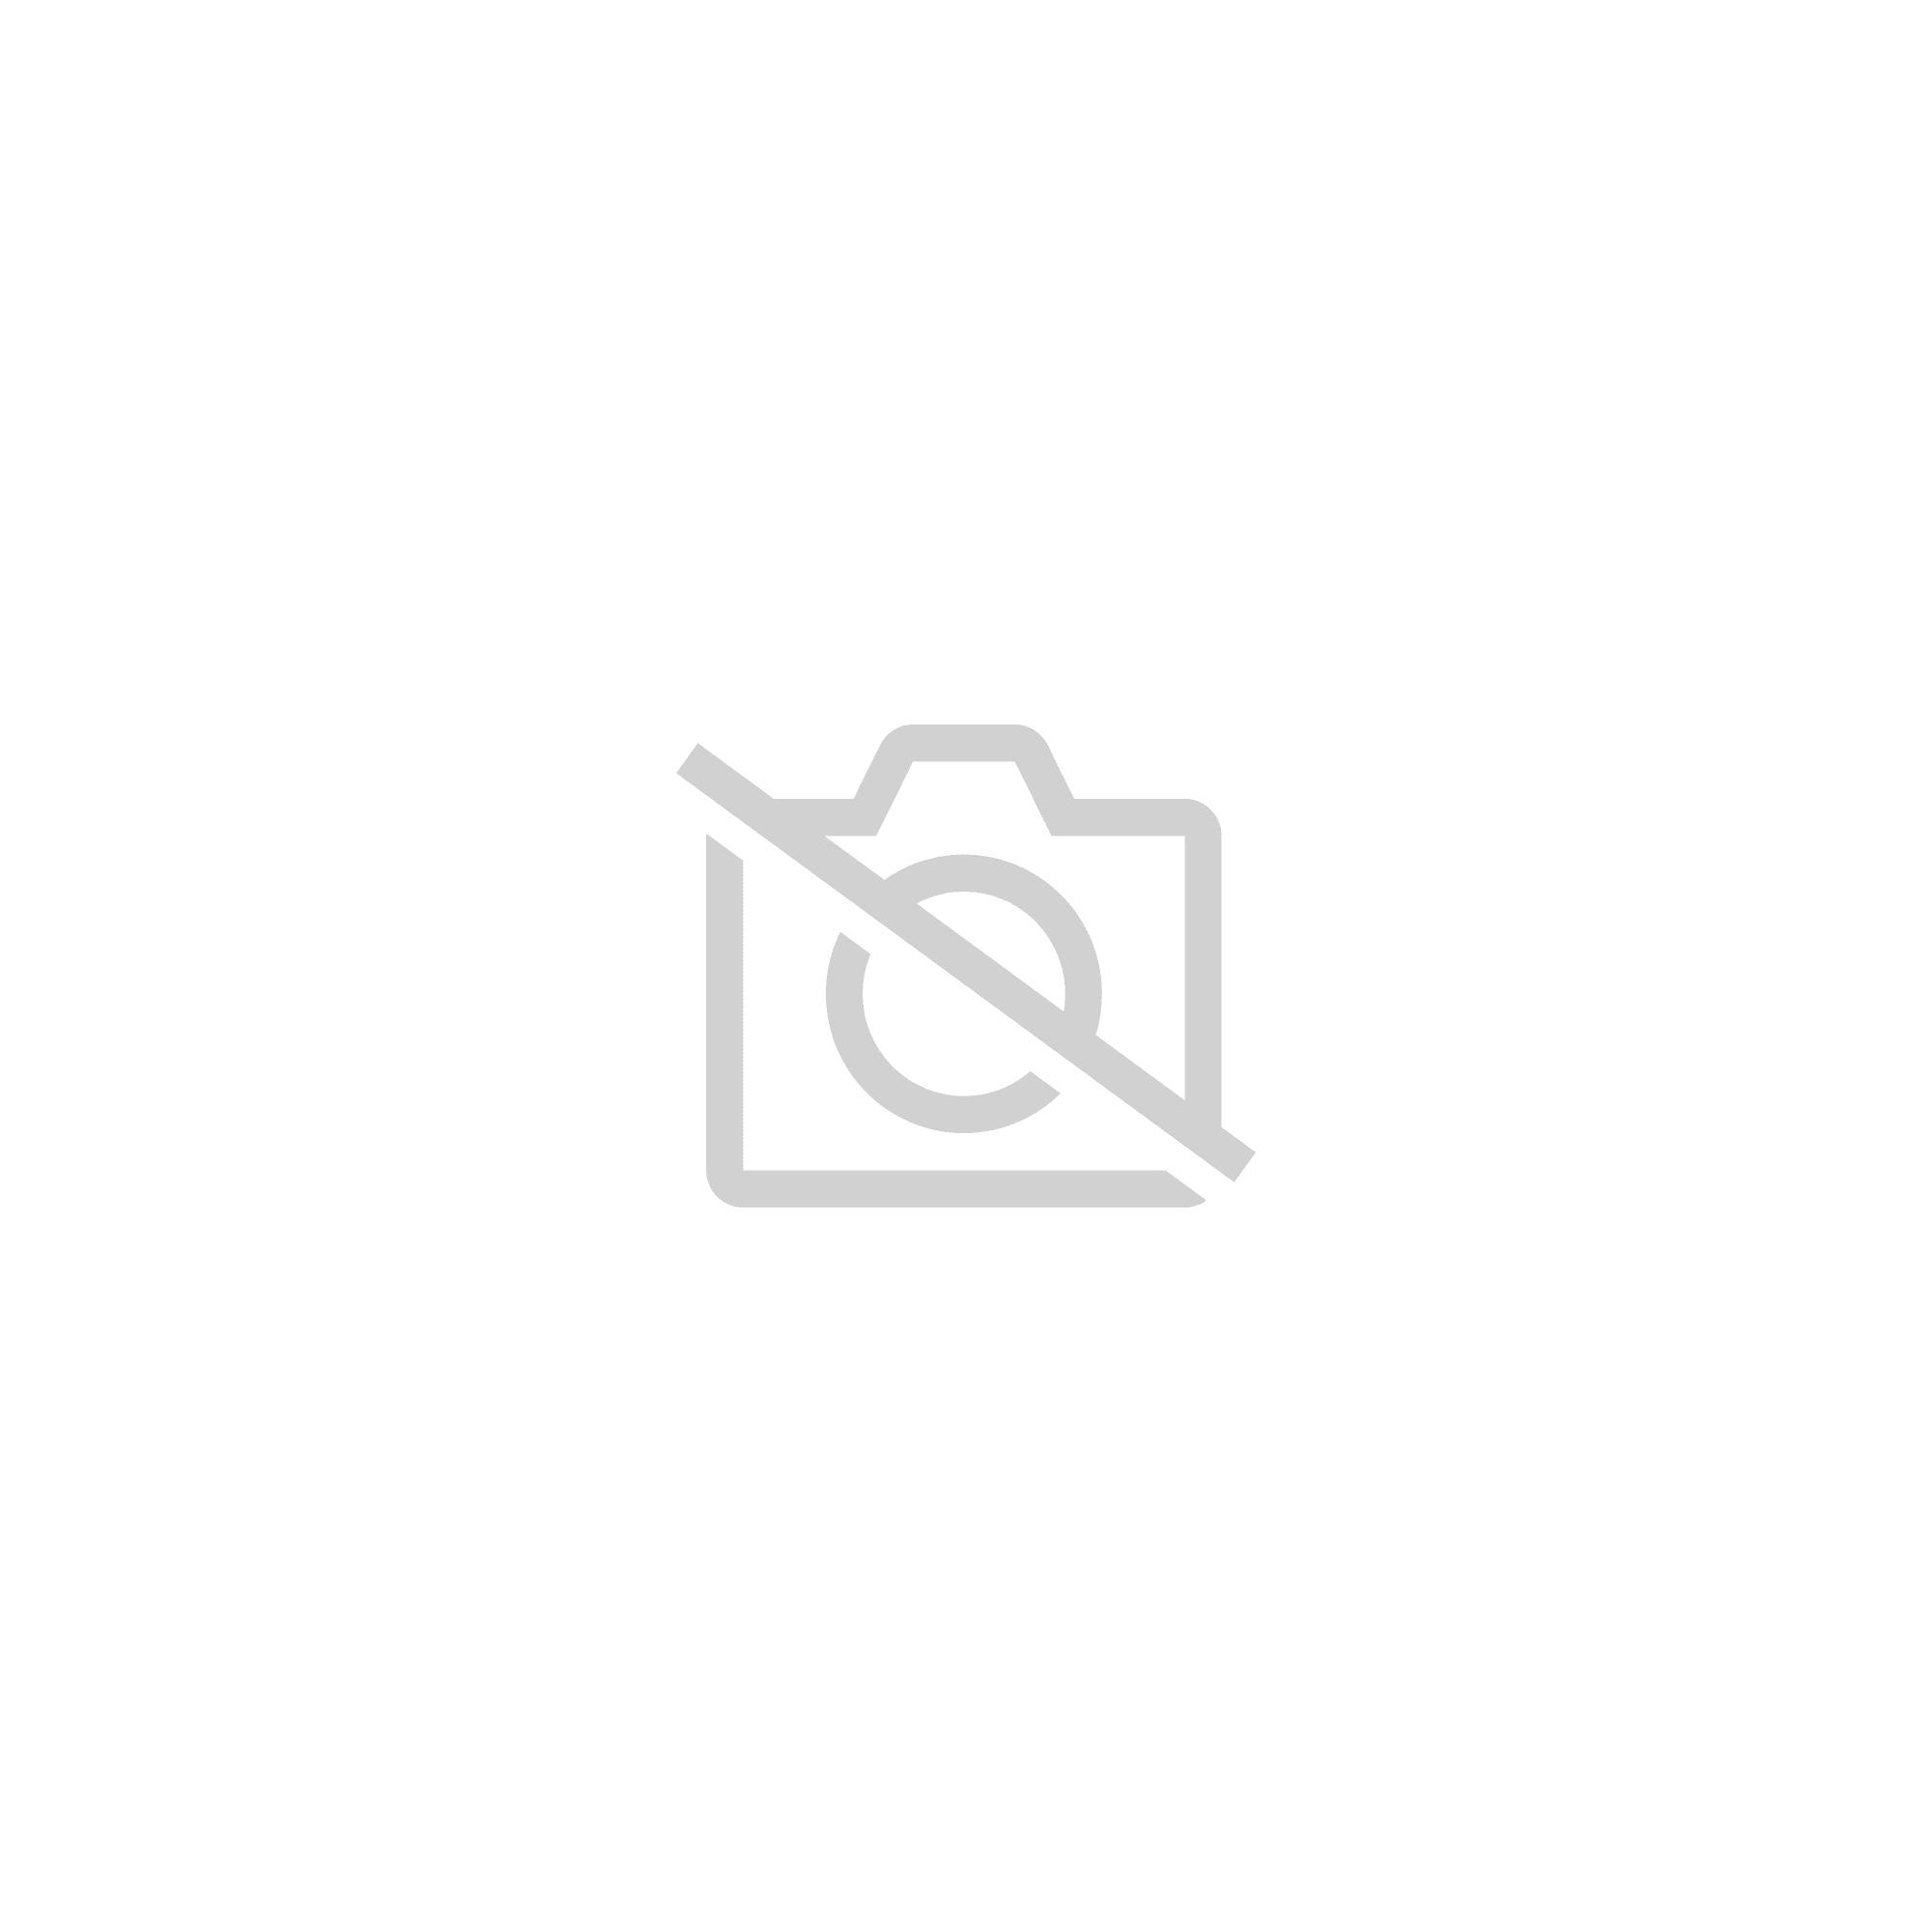 Iomega - Portable Hard Drive Silver Series - Disque dur - 120 Go - externe - Hi-Speed USB - 5400 tours/min - mémoire tampon : 8 Mo